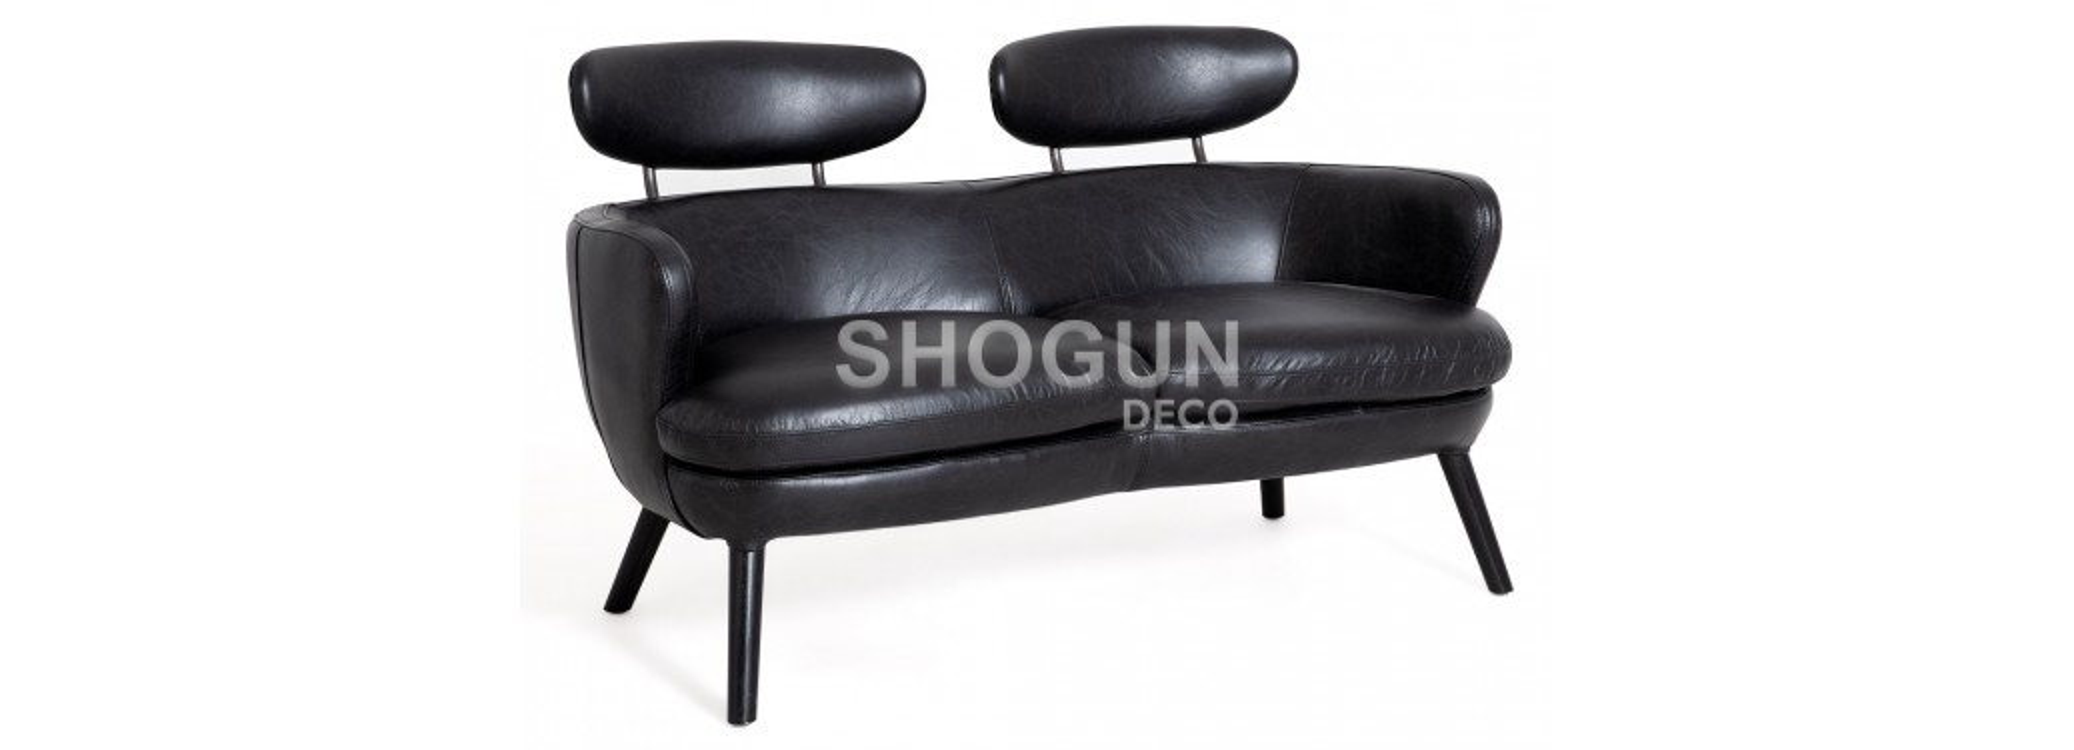 Sofa Rubis - 2 seater - black leather